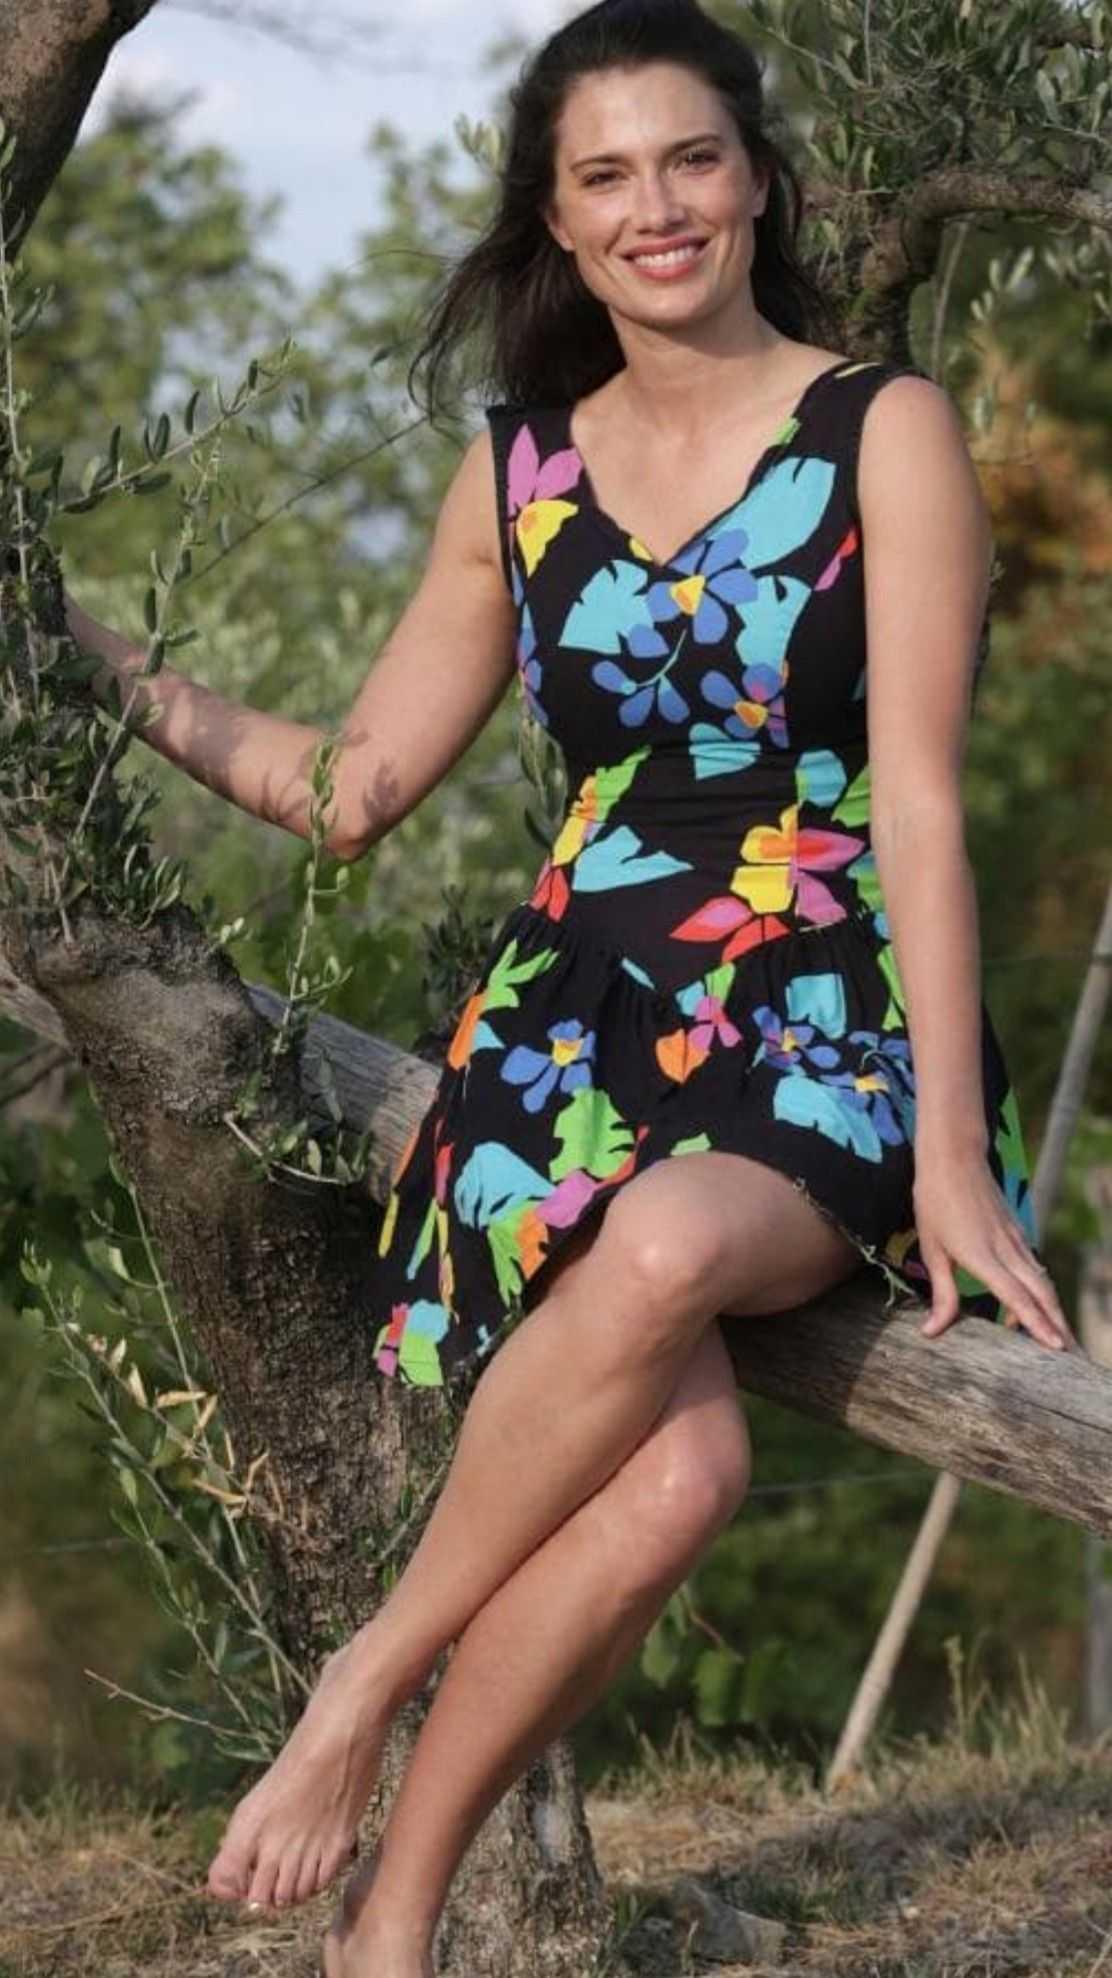 Gabrielle Miller hot feet pic